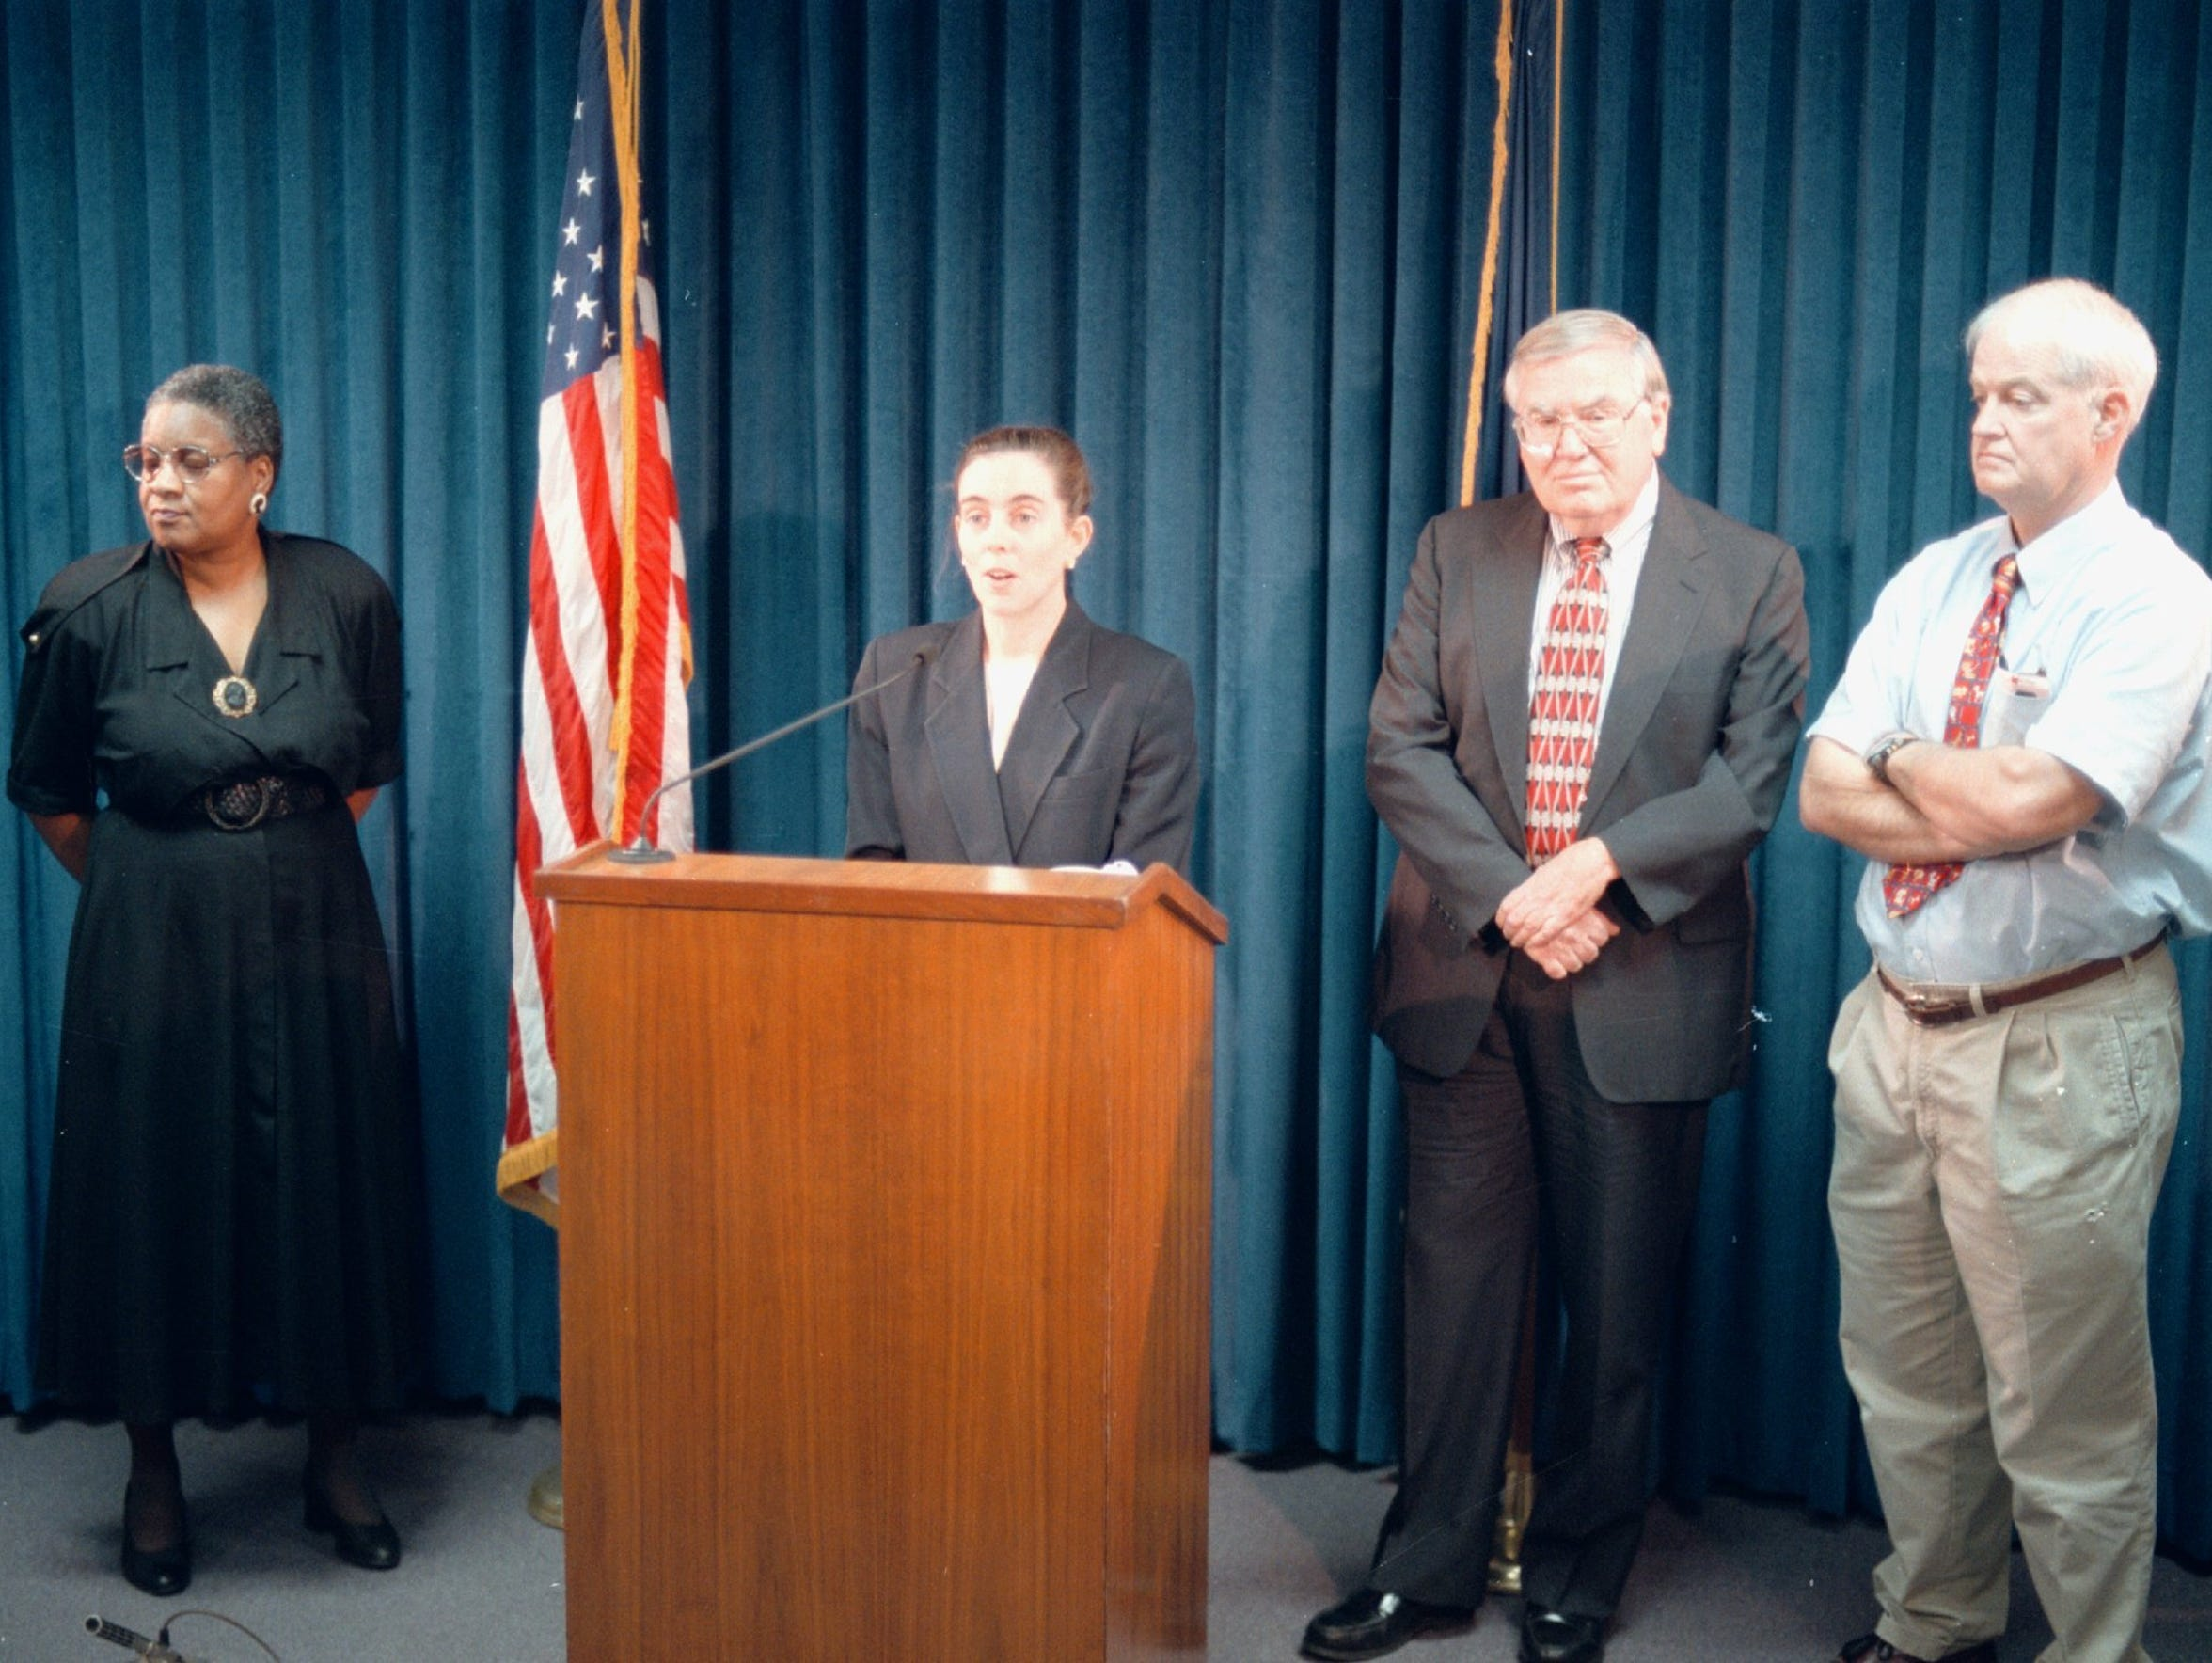 Newly elected Senate Minority Leader Kate Brown, D-Portland,